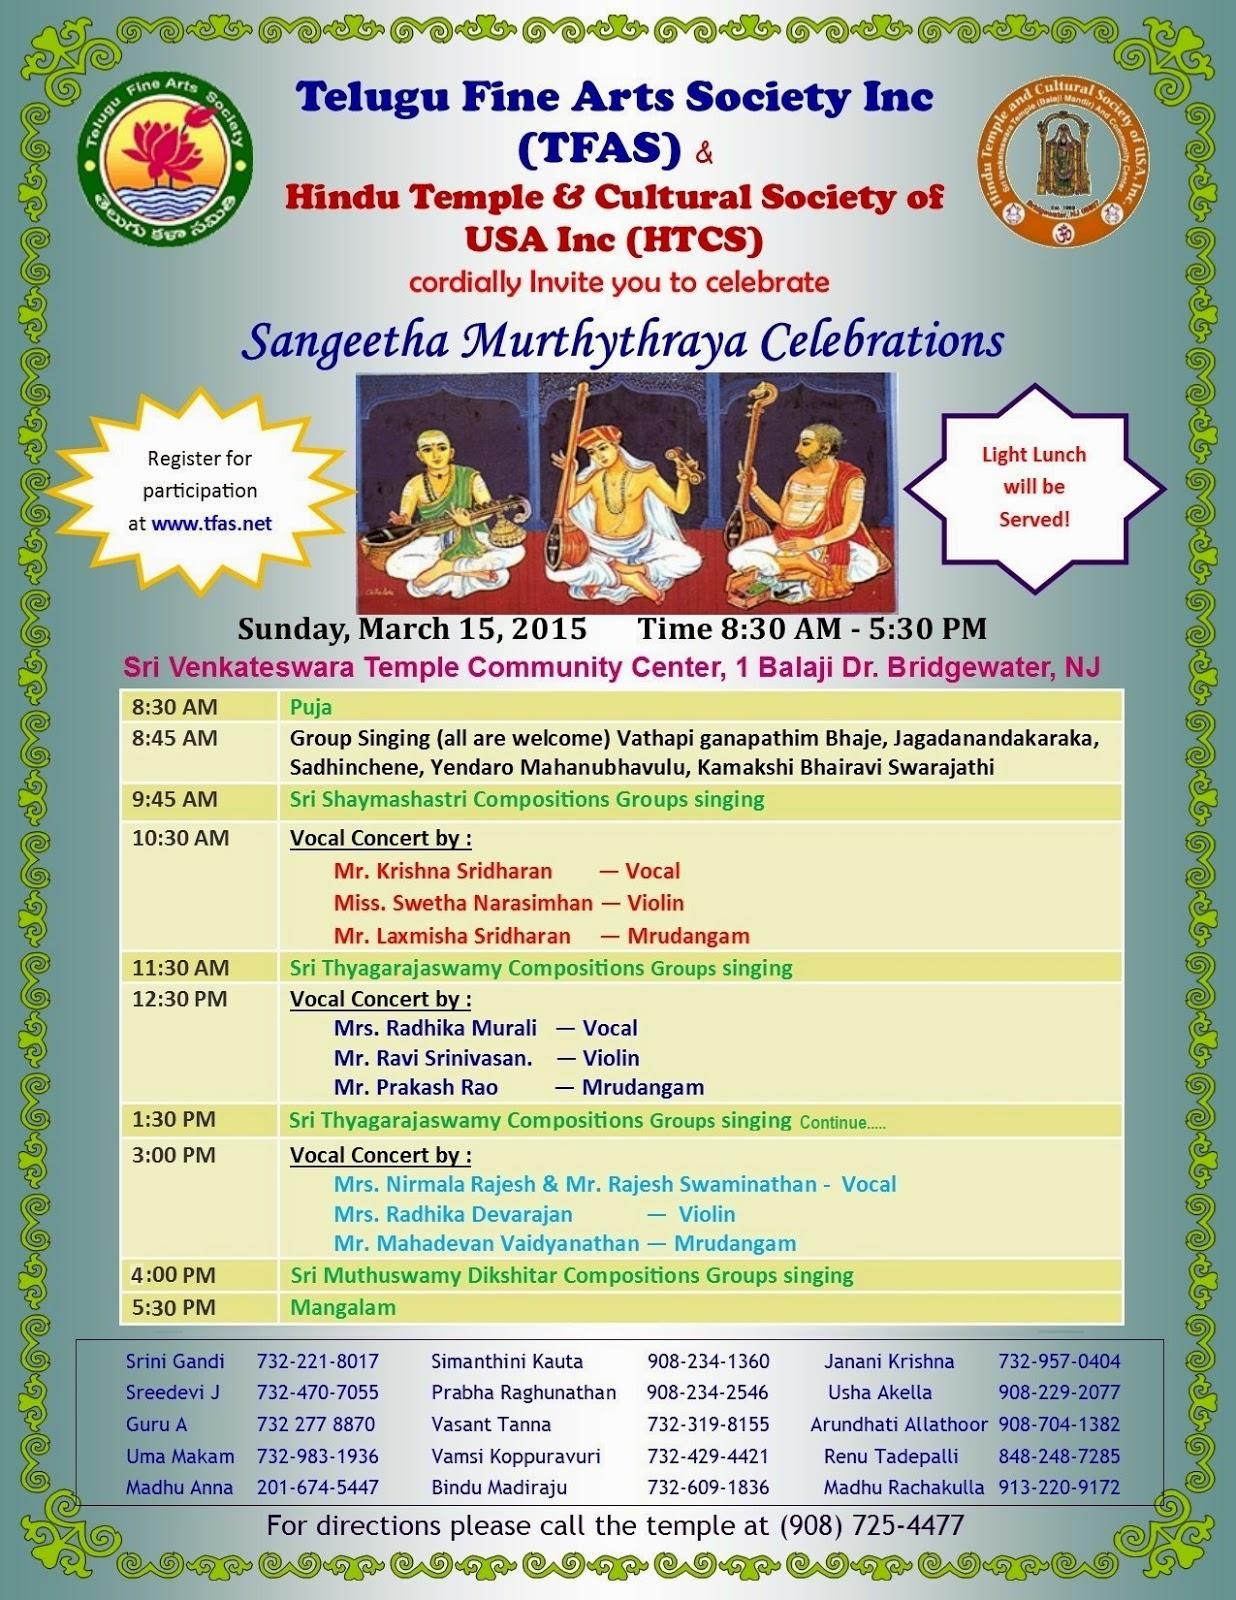 VijayaDhwani - Institute of Carnatic Music